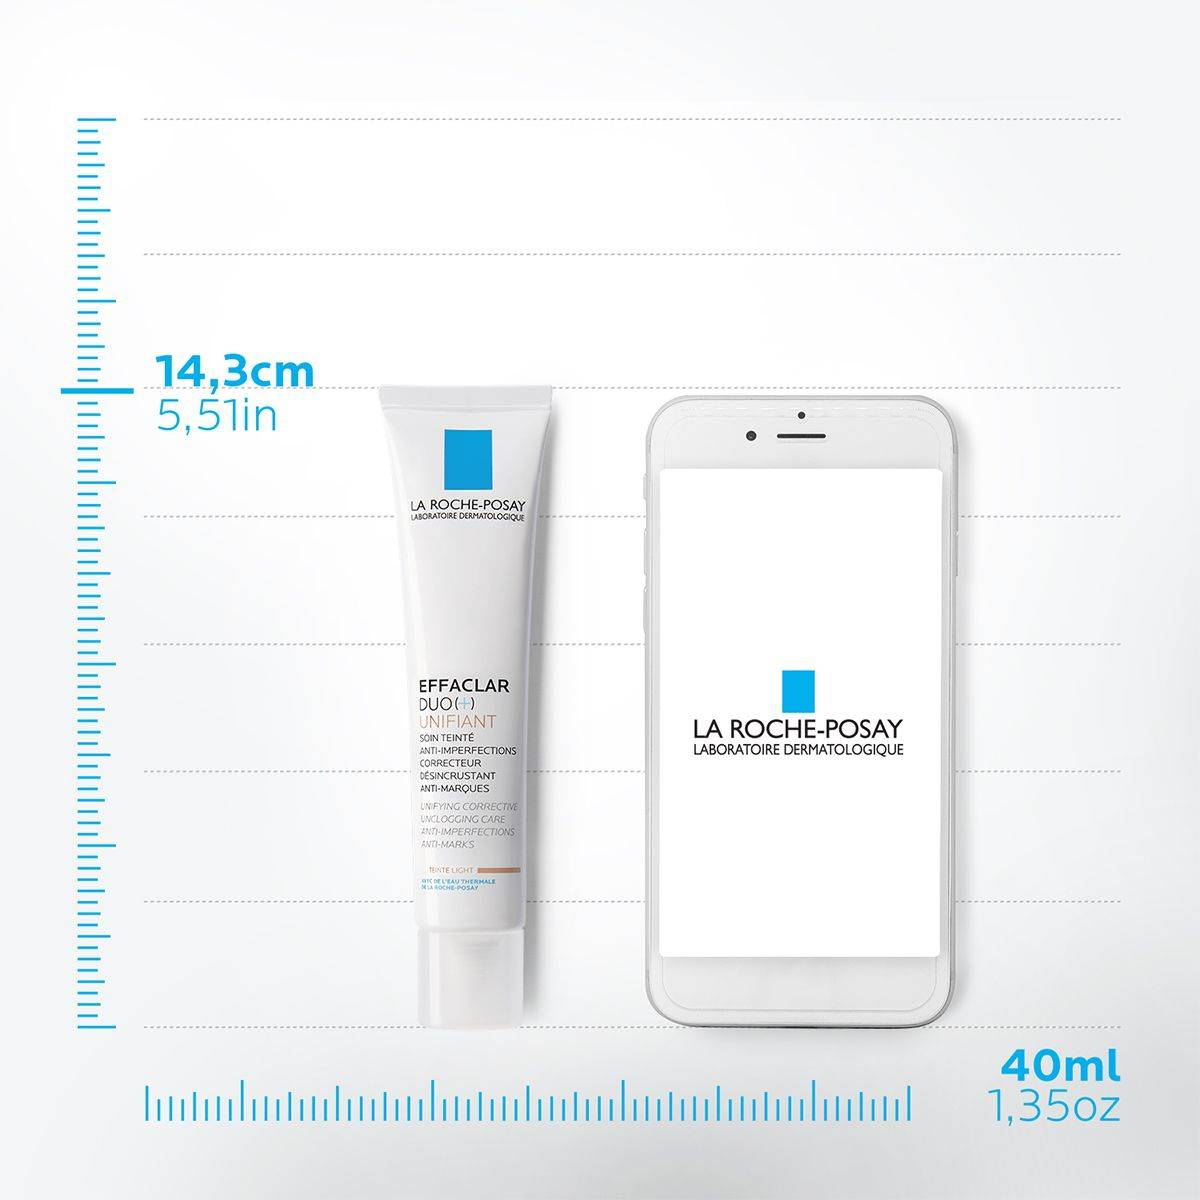 Pielęgnacja twarzyEffaclar Duo plus Unifiant Light 40 ml | La Roche Posay